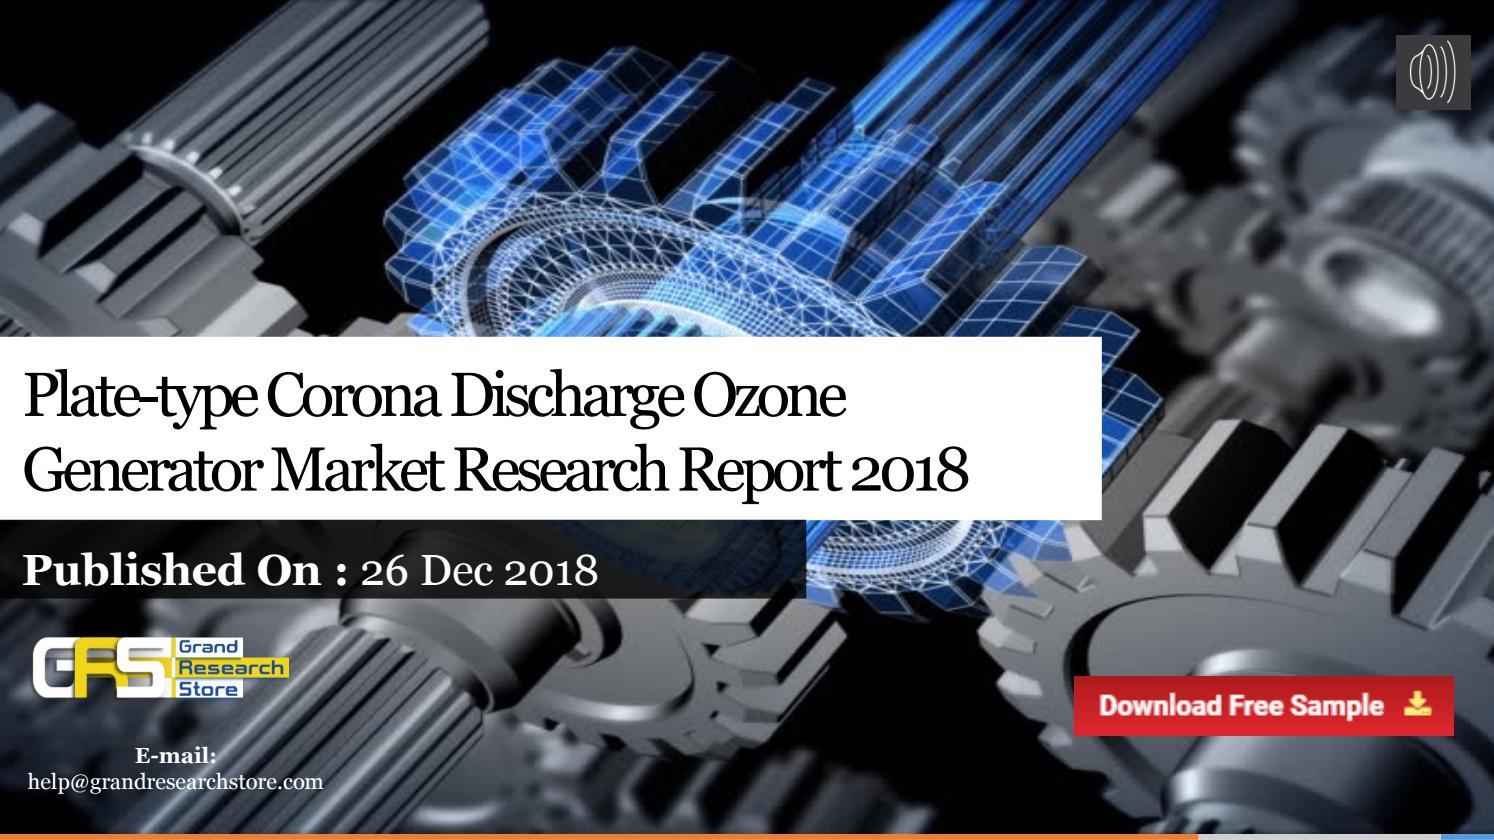 Plate type corona discharge ozone generator market research